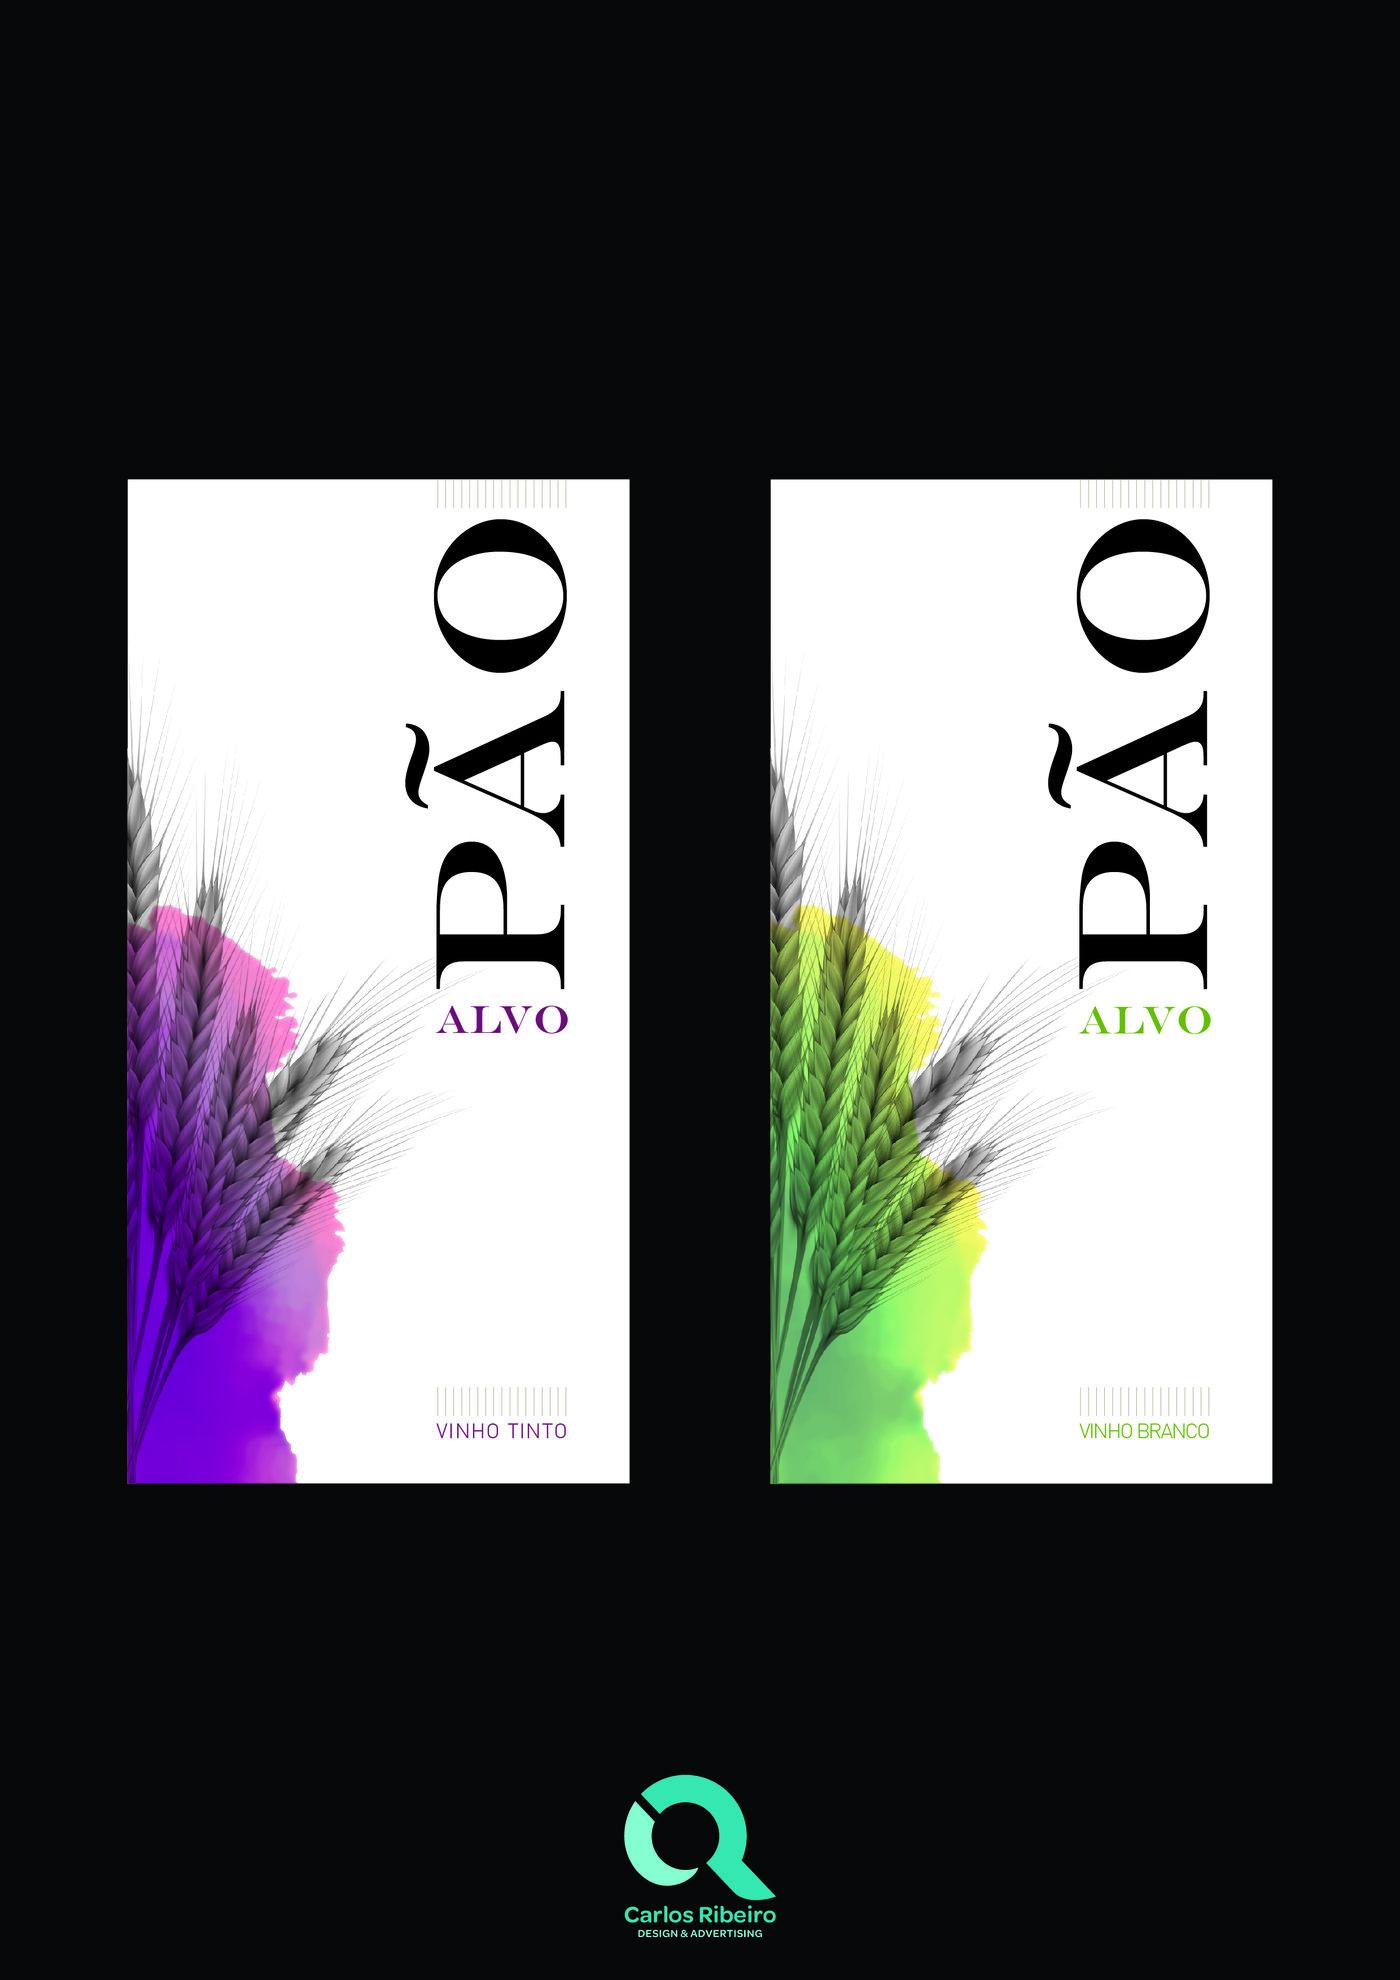 Wine Labels Design By Carlos Ribeiro At Coroflot Com